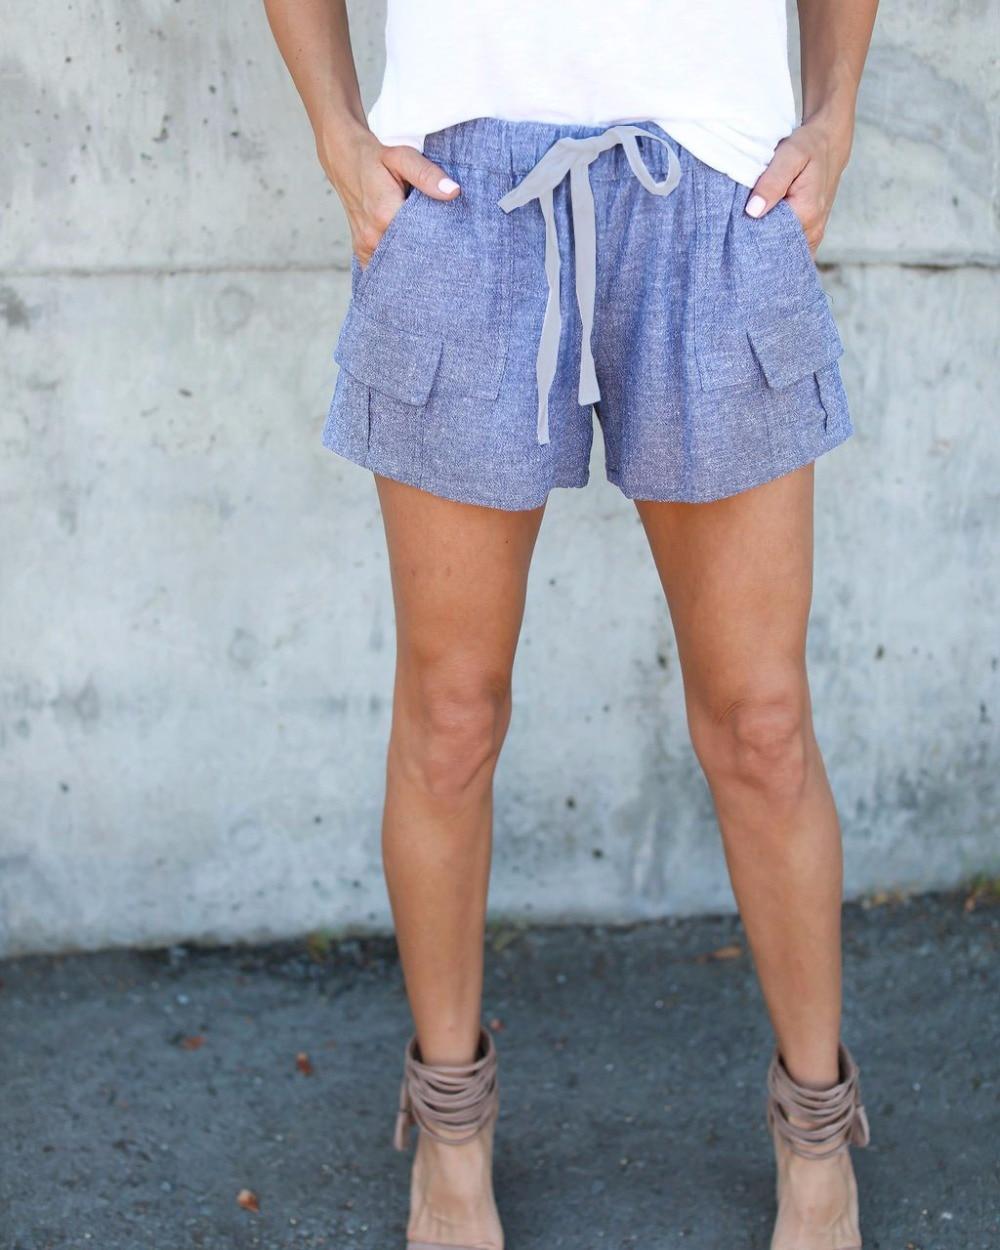 aa5913157 2019 Fashion Women Comfy Hot shorts Summer Blue Casual Shorts High Waist  Hot Drawstring Shorts Feminino shorts Exercise Trousers-in Shorts from  Women's ...